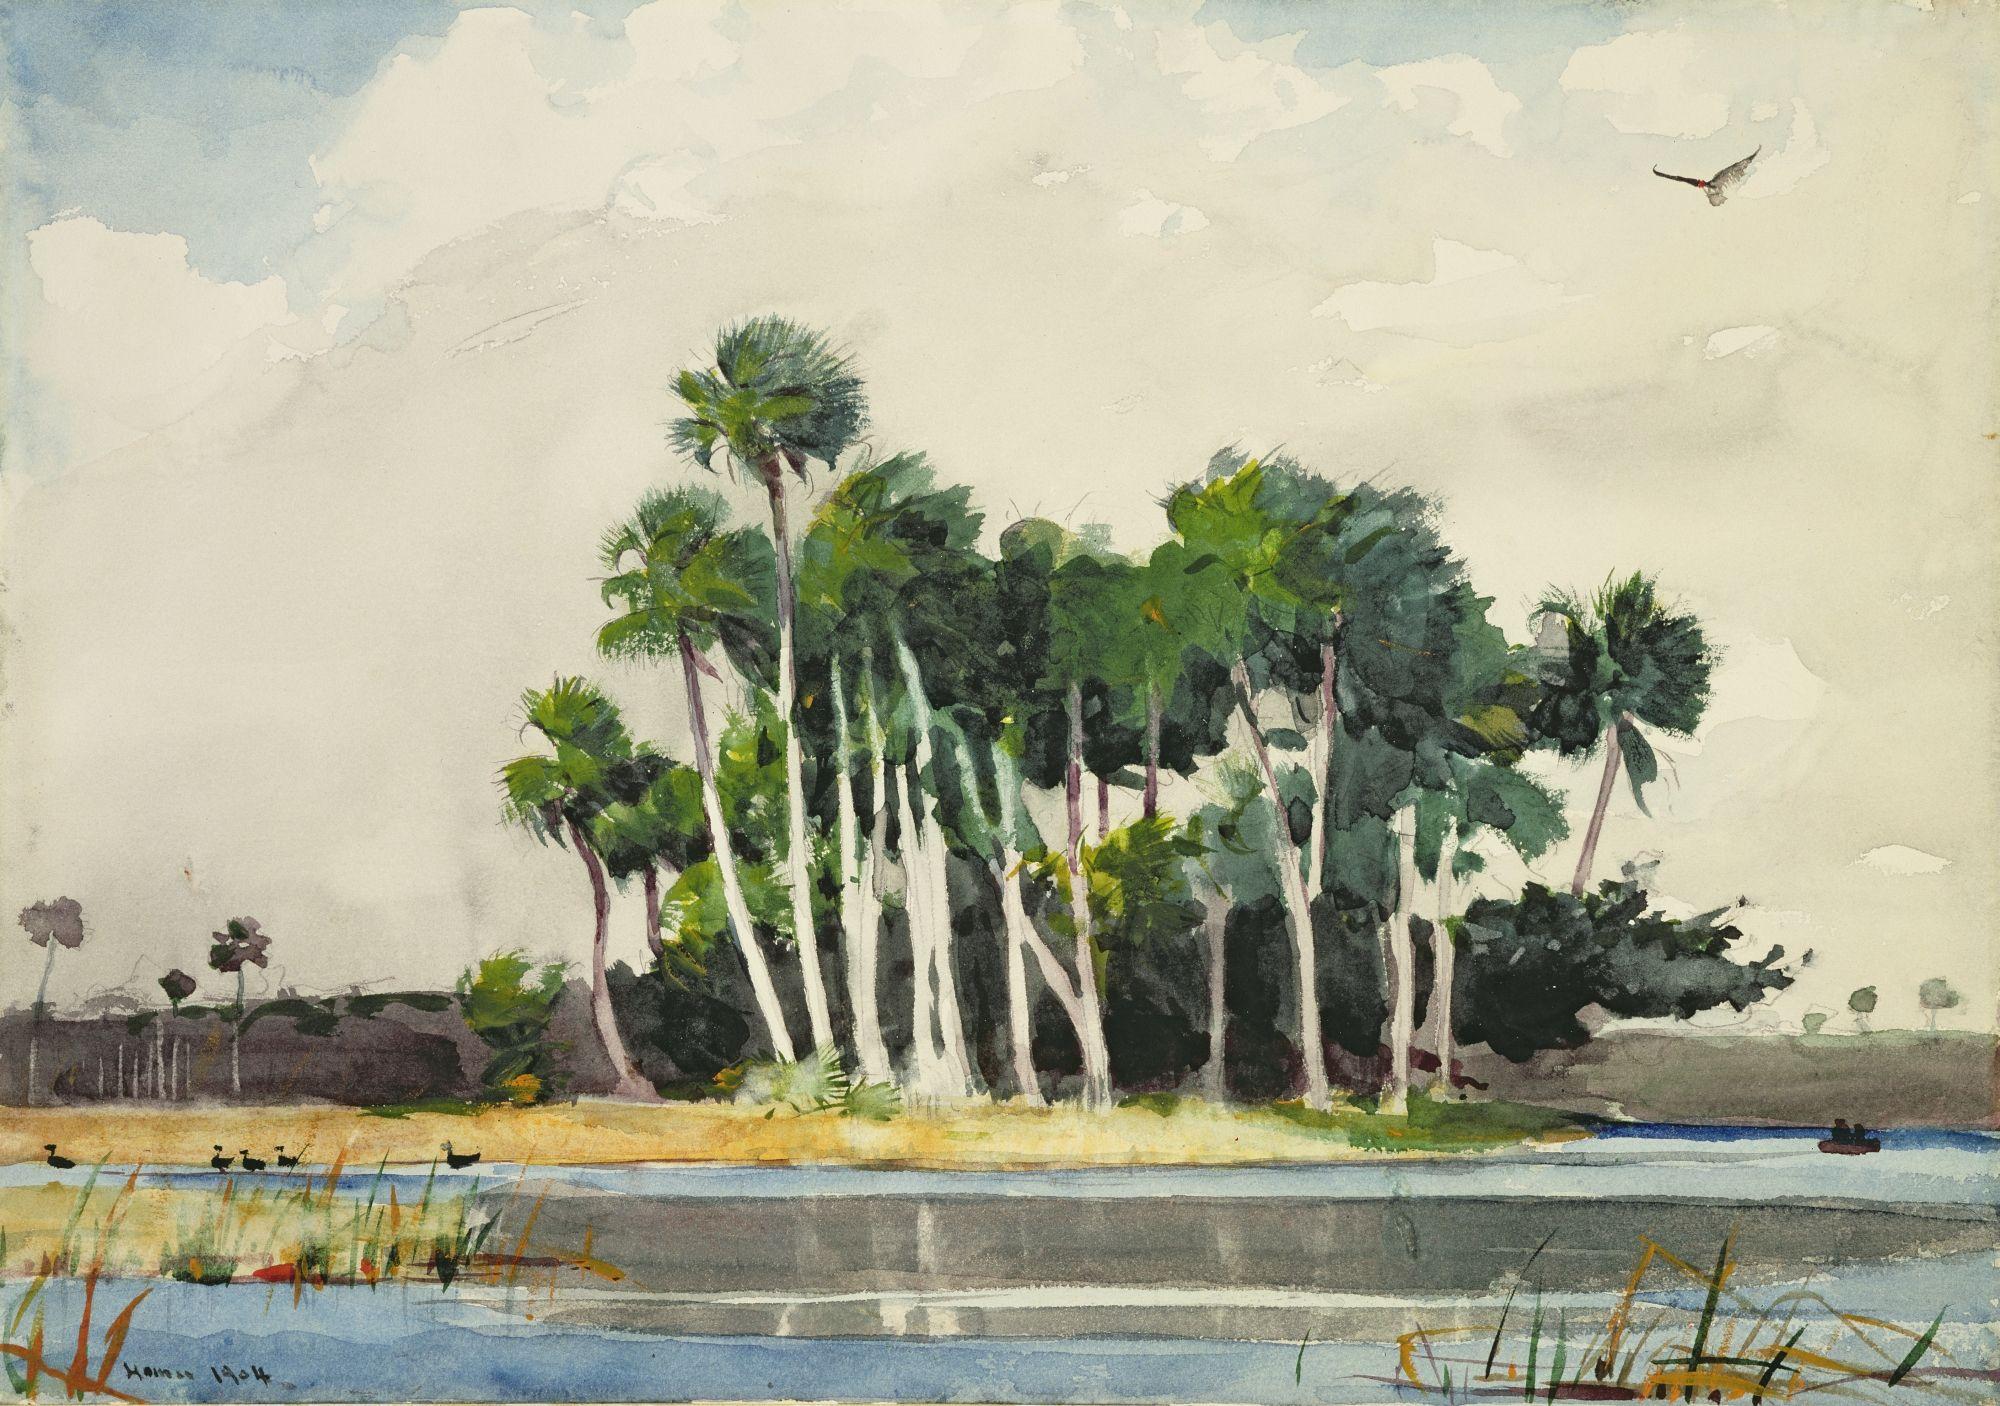 Winslow Homer Art Paysage Peinture Peinture Aquarelle